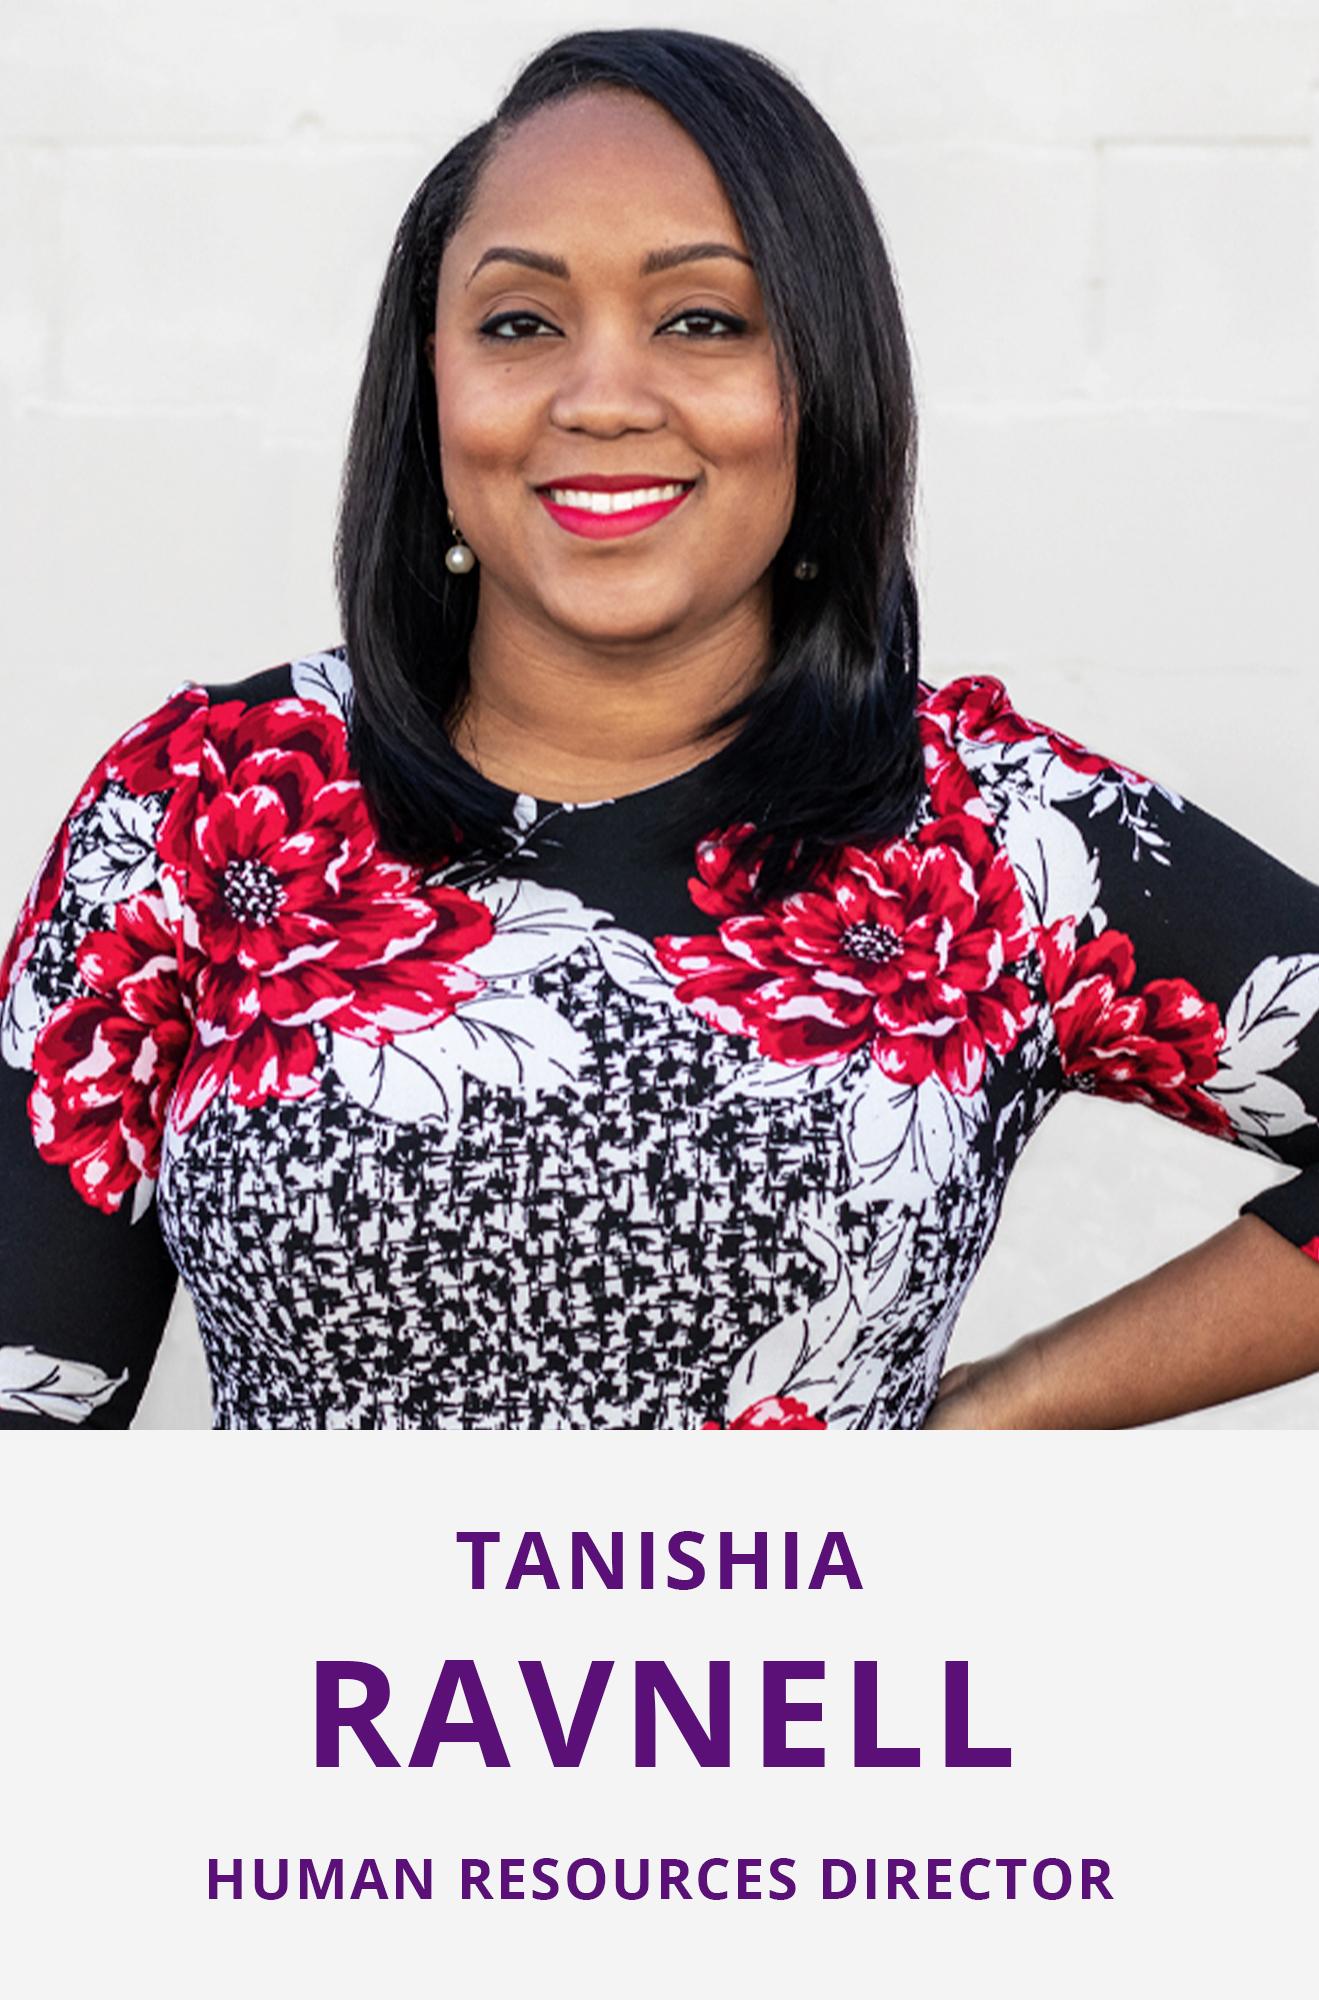 Tanisha Ravnell